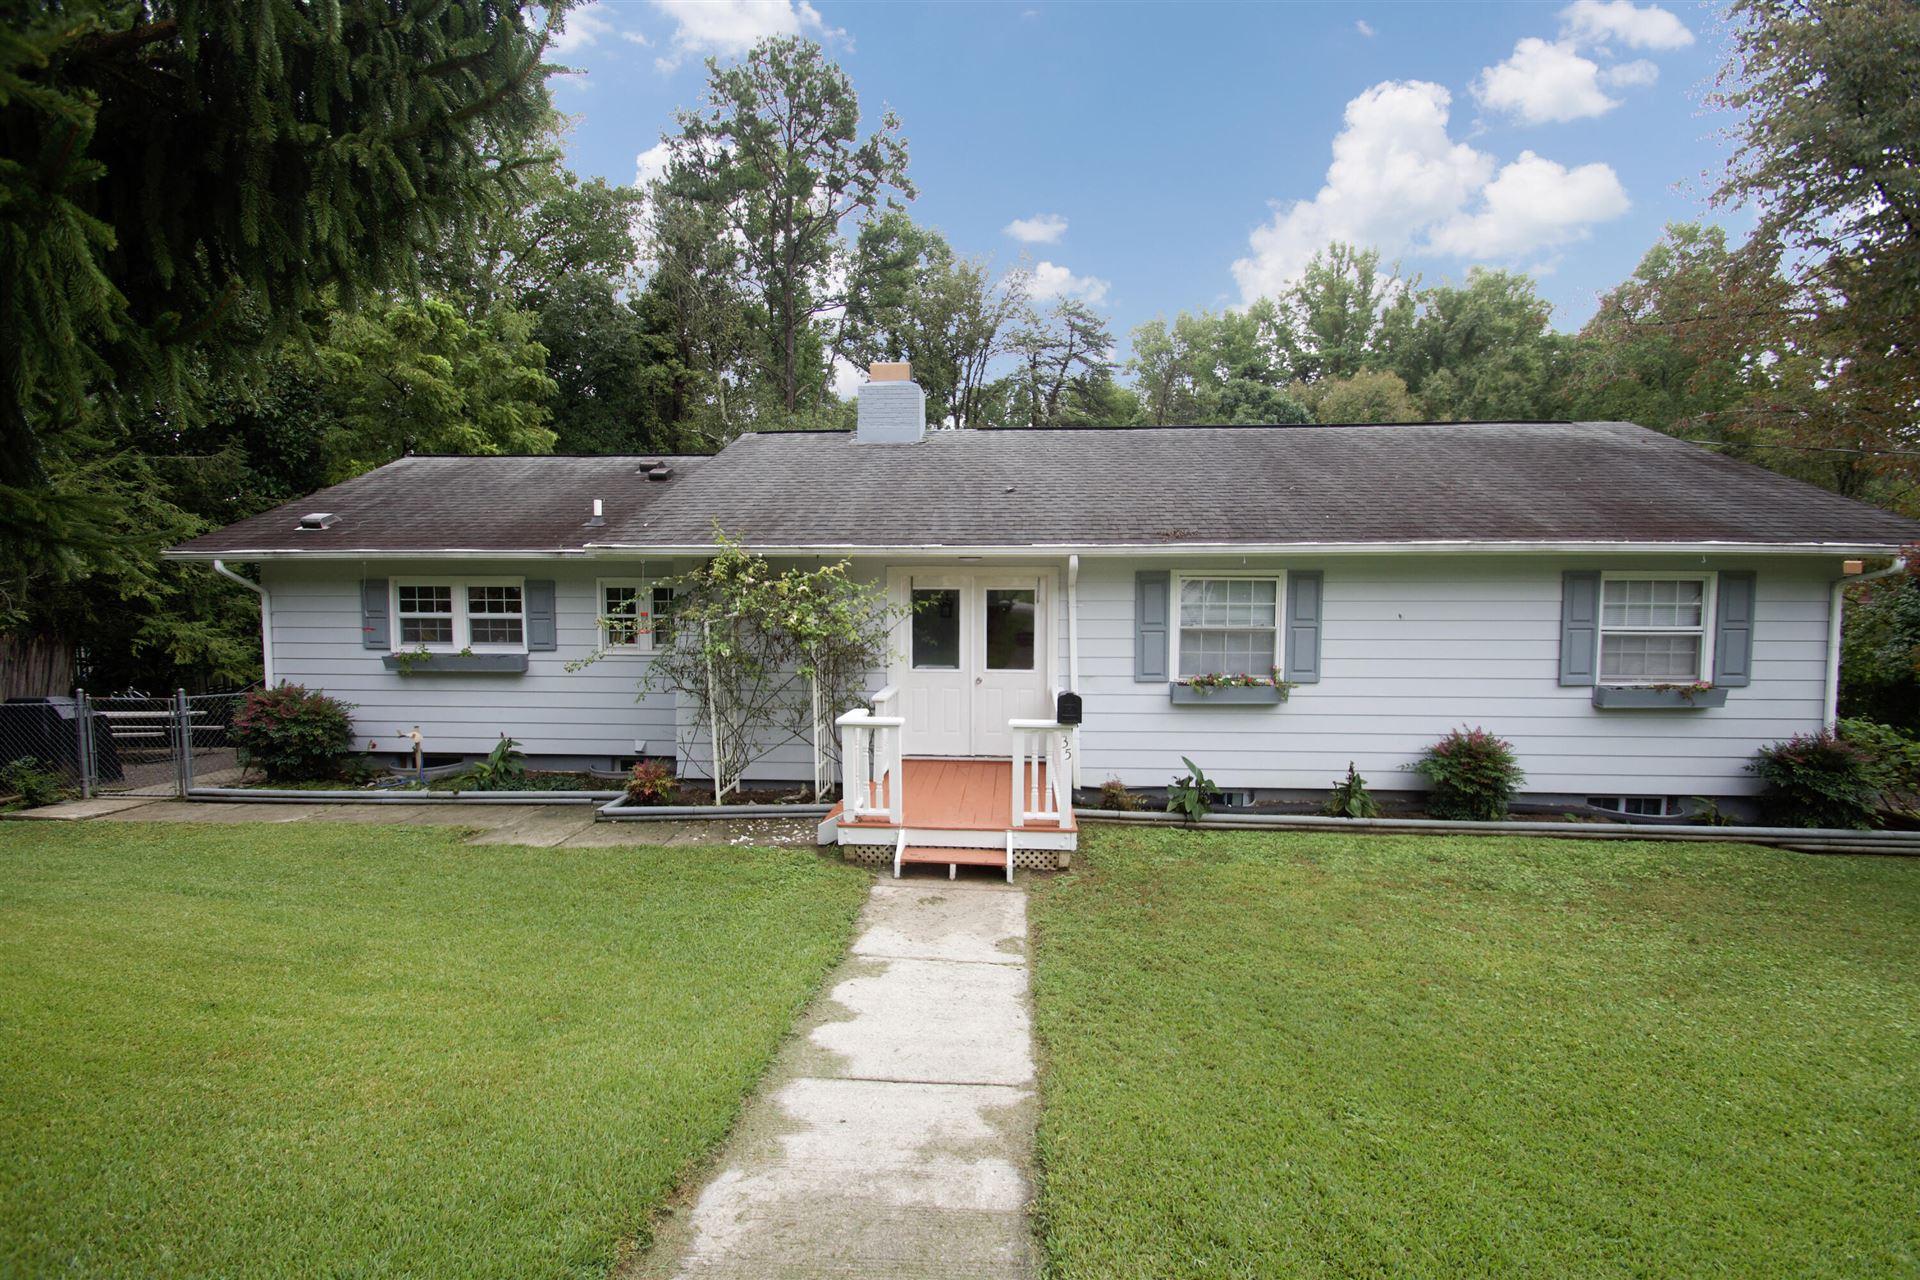 Photo of 35 Outer Drive, Oak Ridge, TN 37830 (MLS # 1167201)